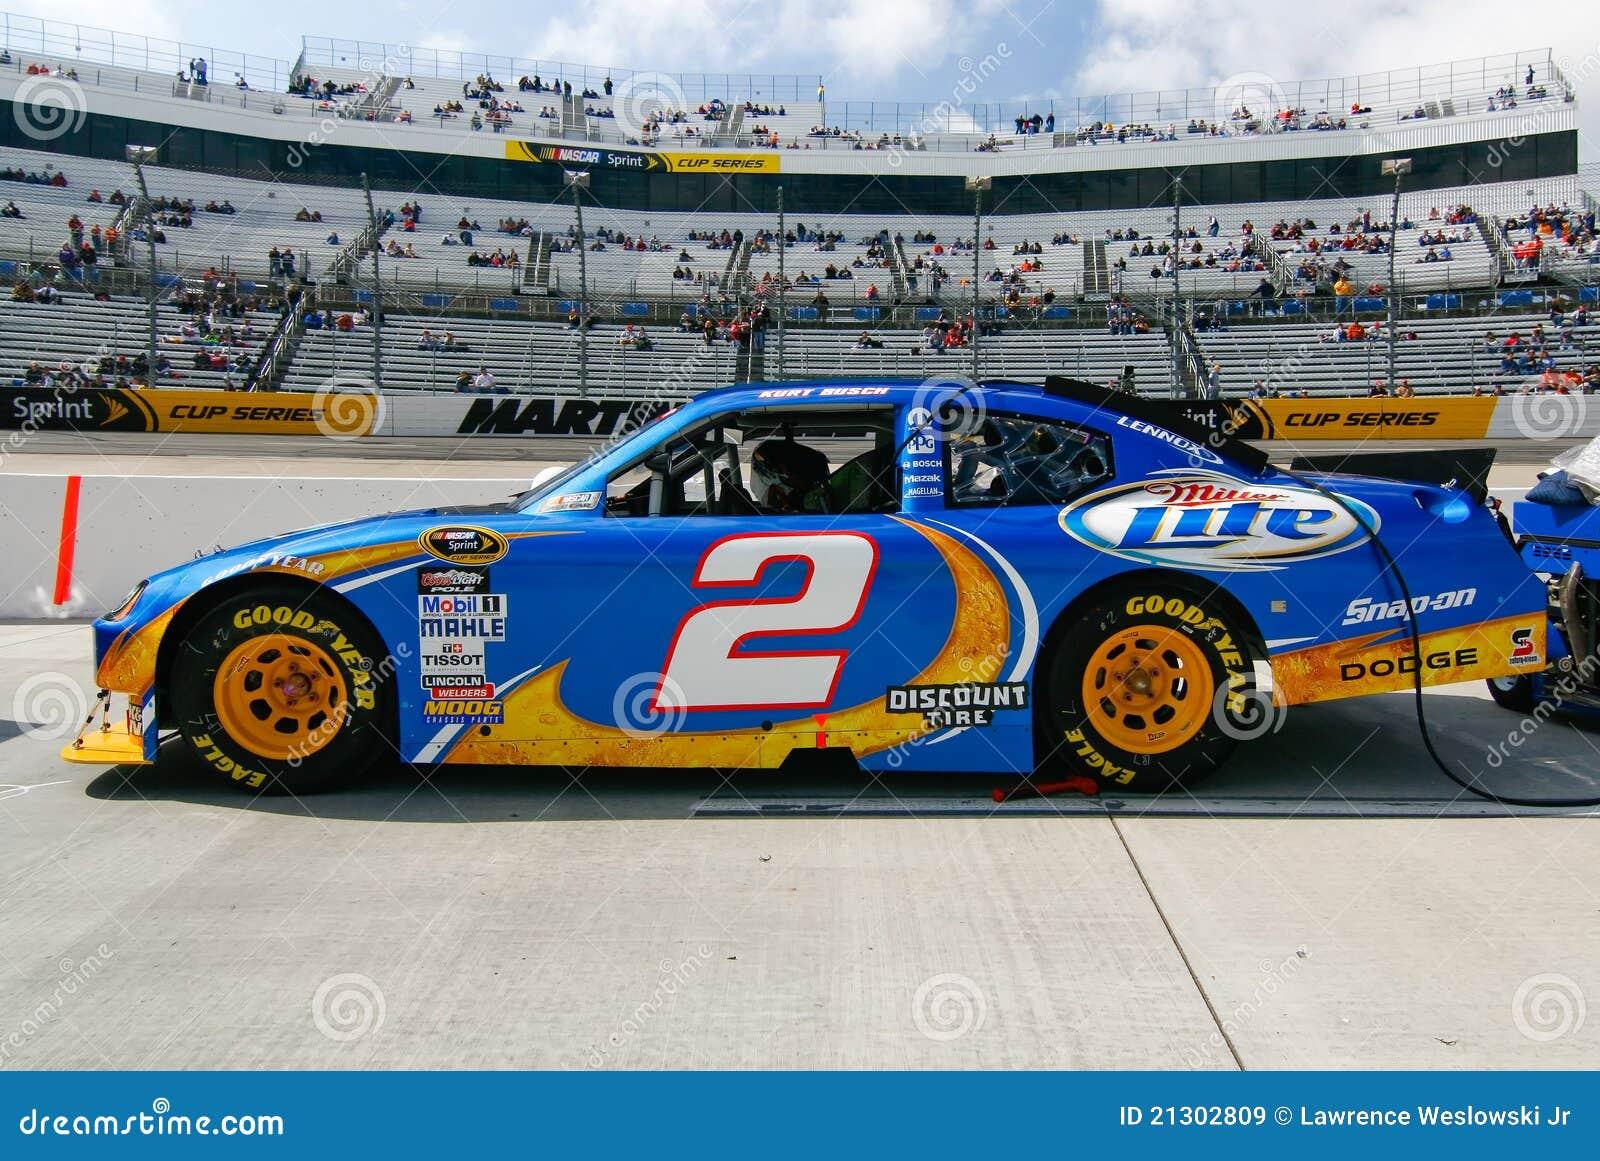 NASCAR - Kurt Busch's #2 Miller Lite Car Editorial Stock Image - Image: 21302809